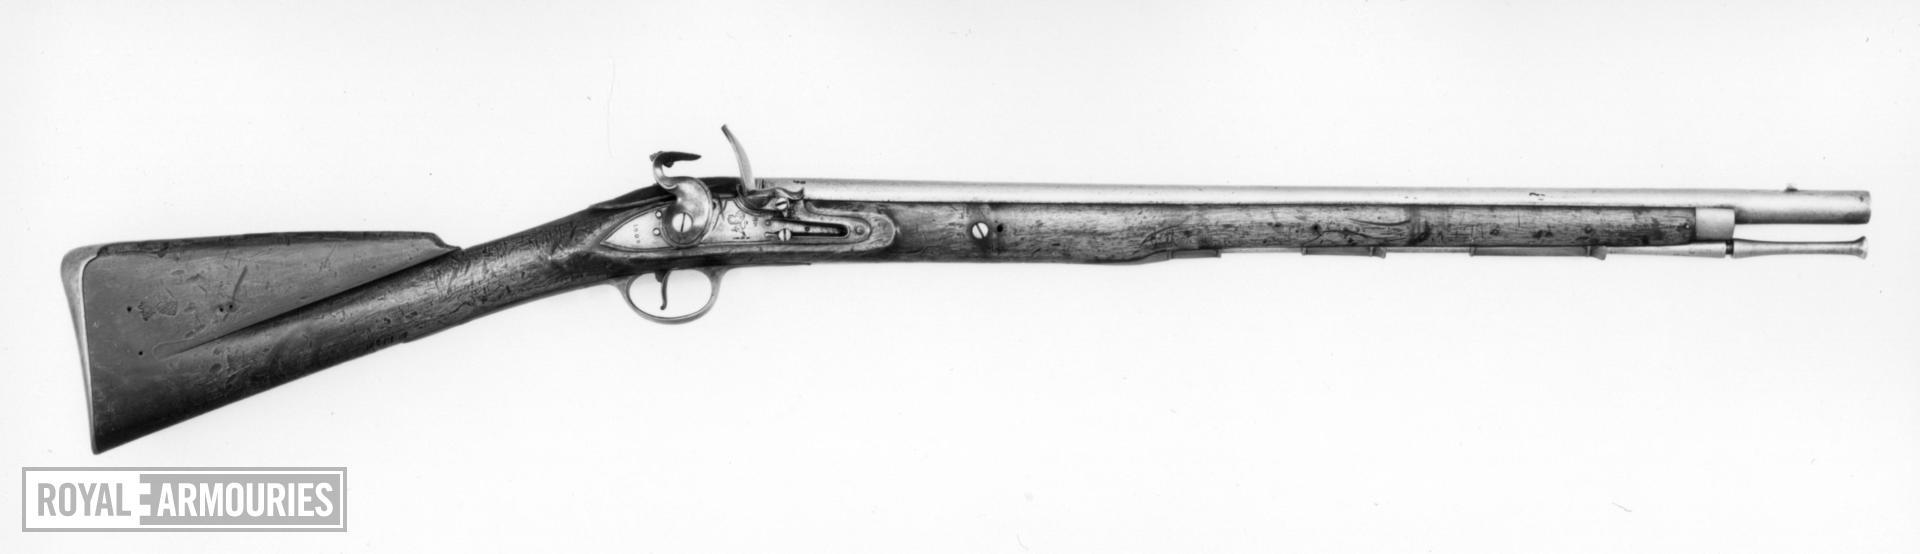 Flintlock muzzle-loading cavalry carbine - Elliott Carbine